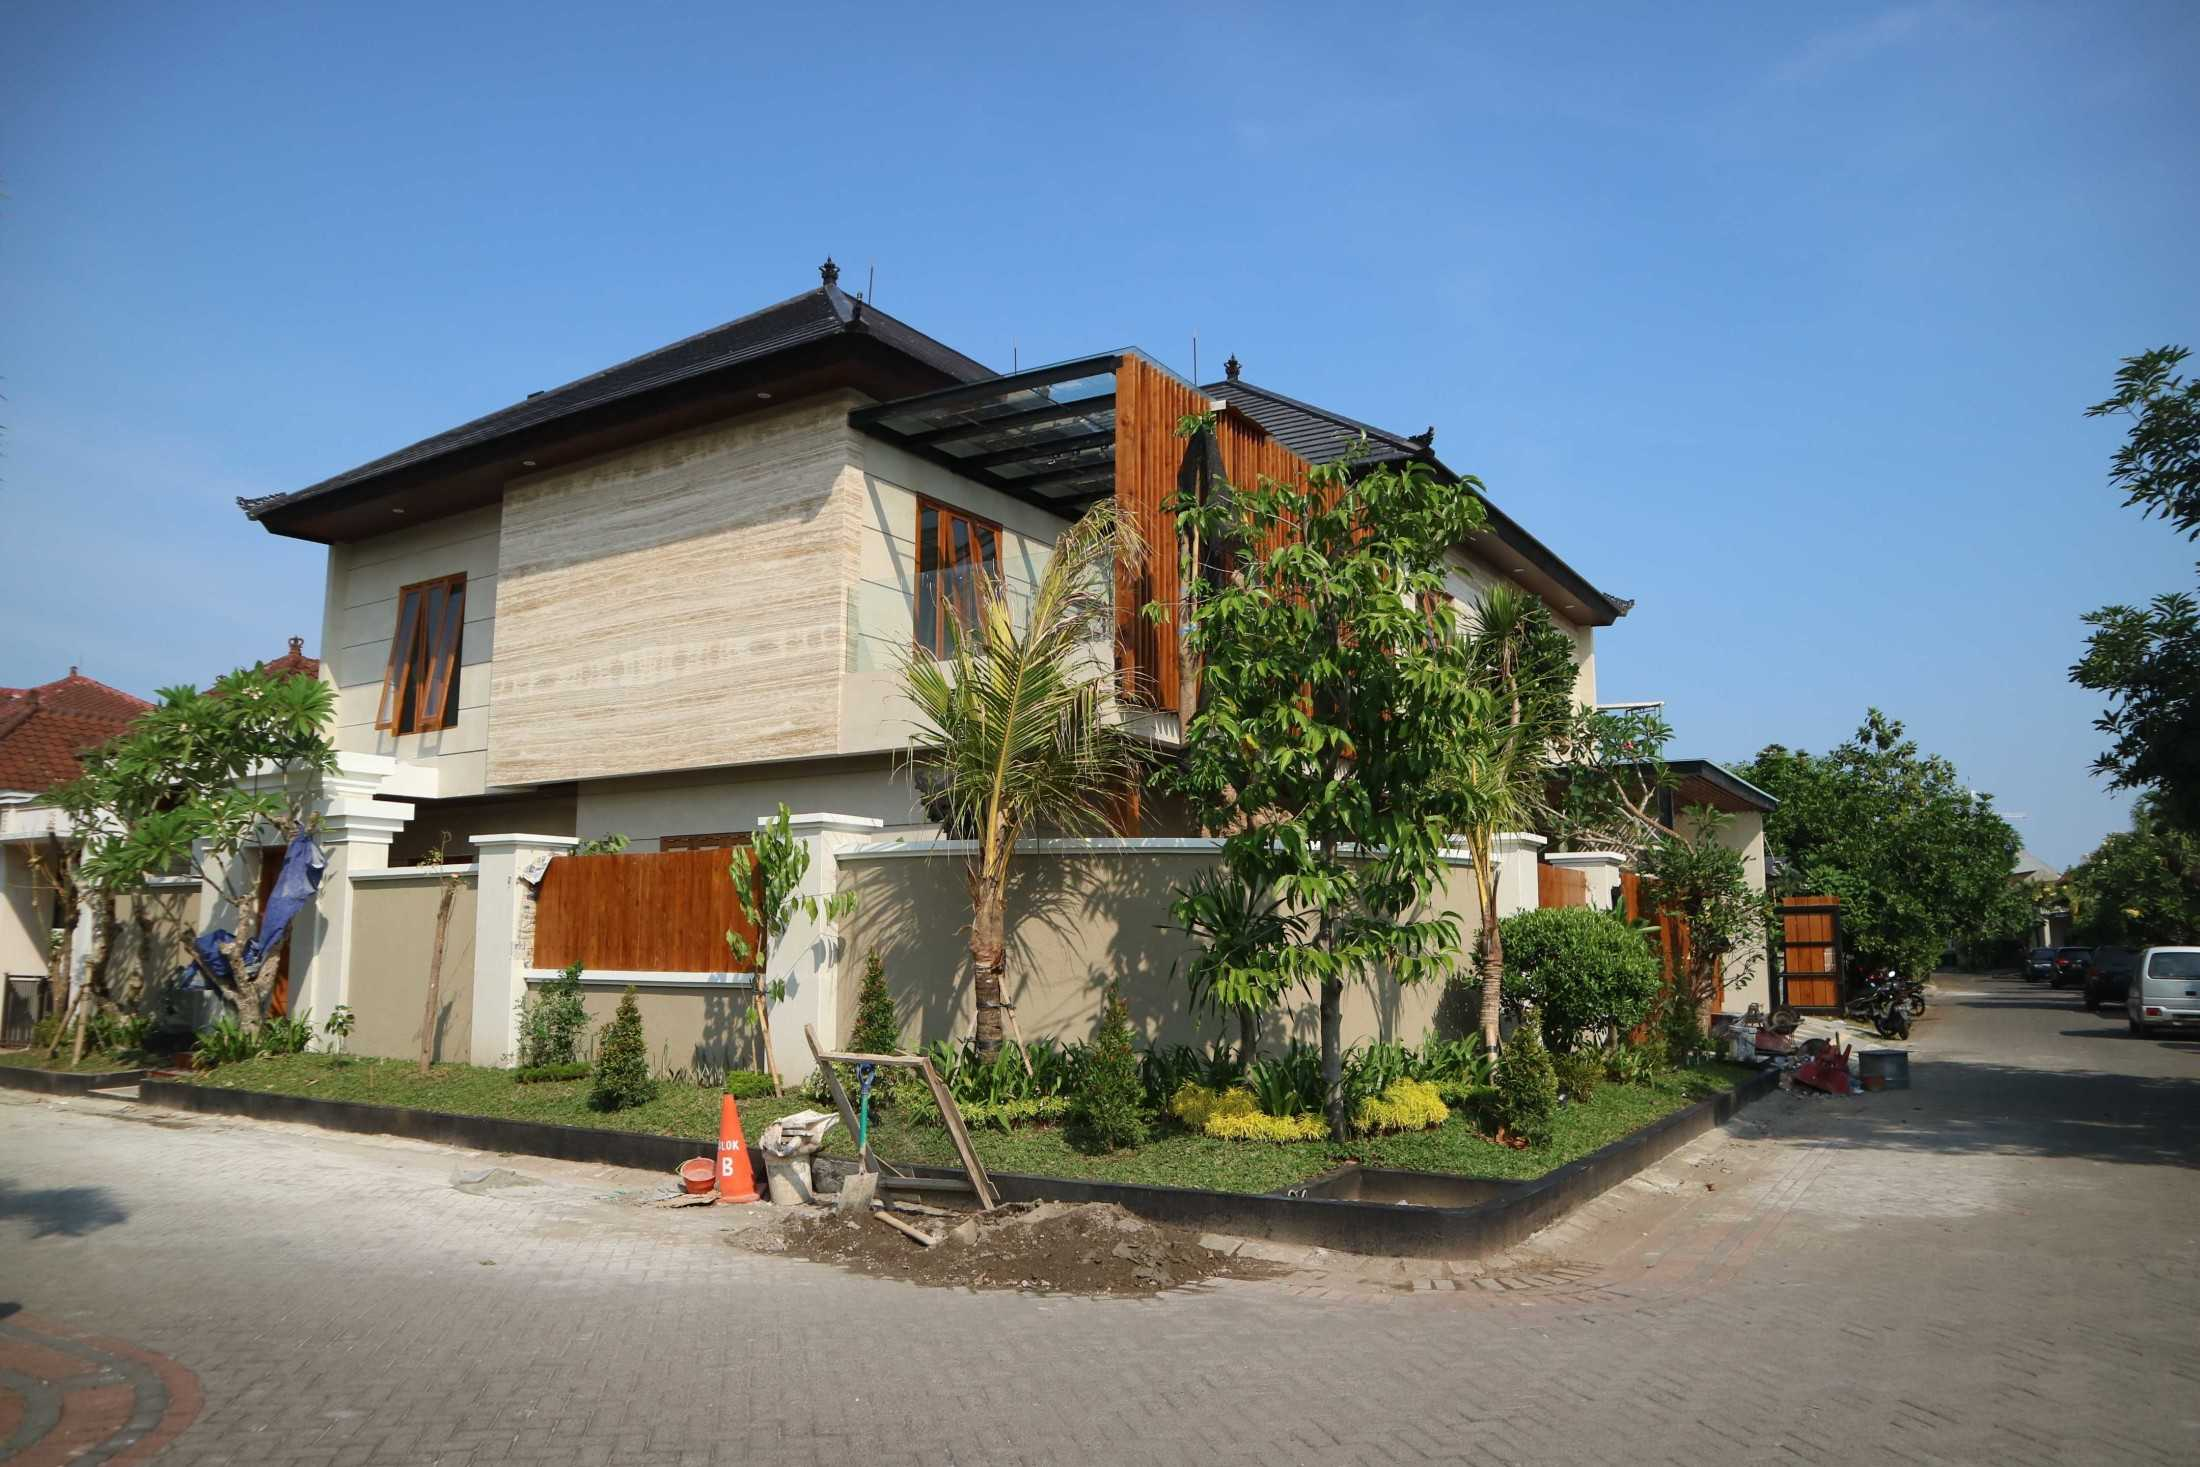 Arbiy Kreasi Rumah Pm Surabaya, Kota Sby, Jawa Timur, Indonesia Surabaya, Kota Sby, Jawa Timur, Indonesia Arbiy-Kreasi-Rumah-Pm  111206